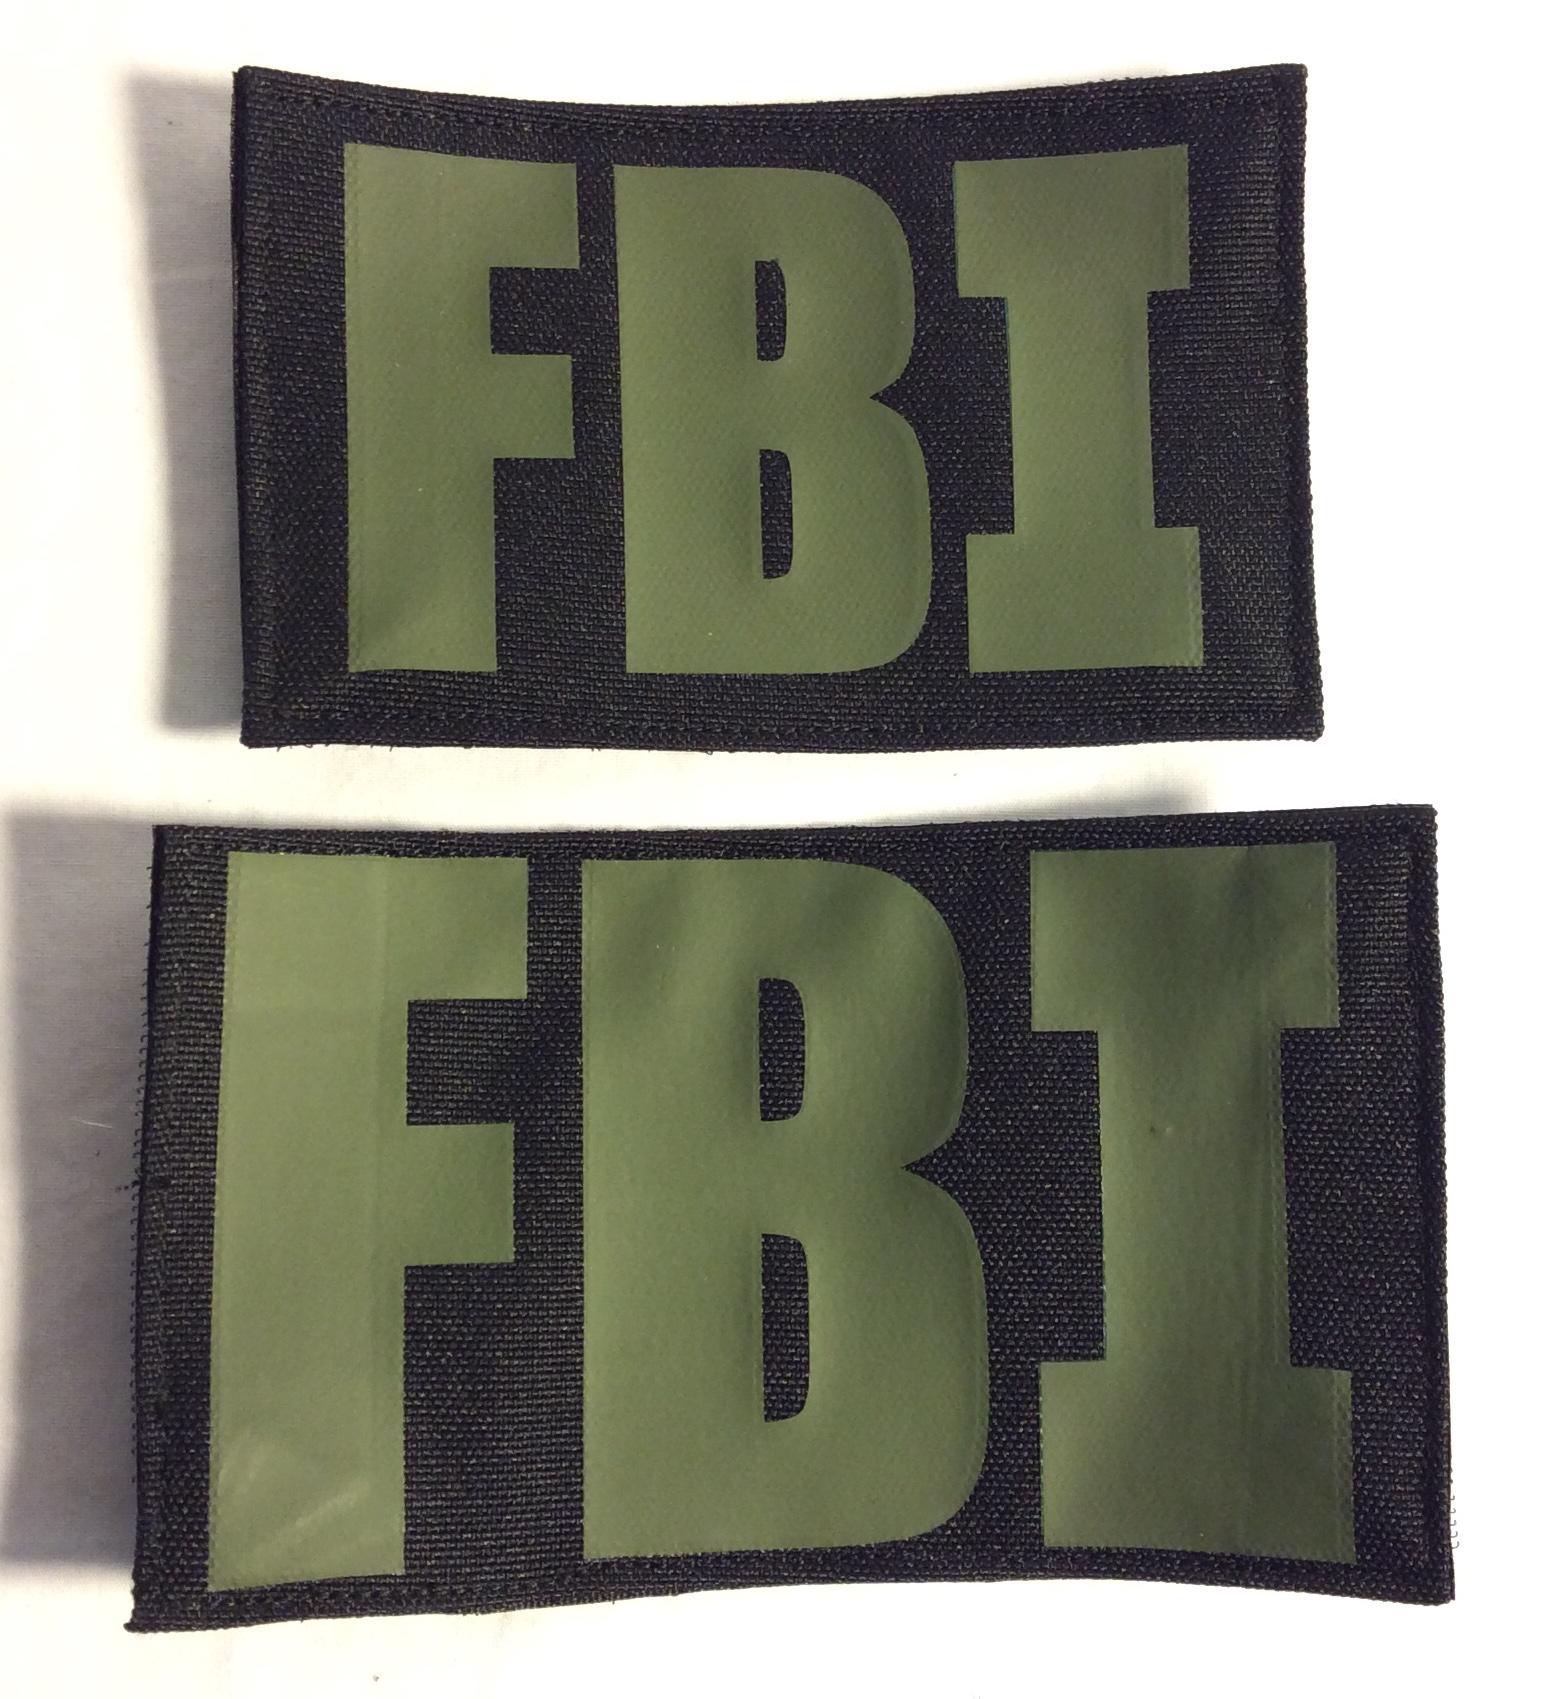 FBI Velcro Patches, Green on Black